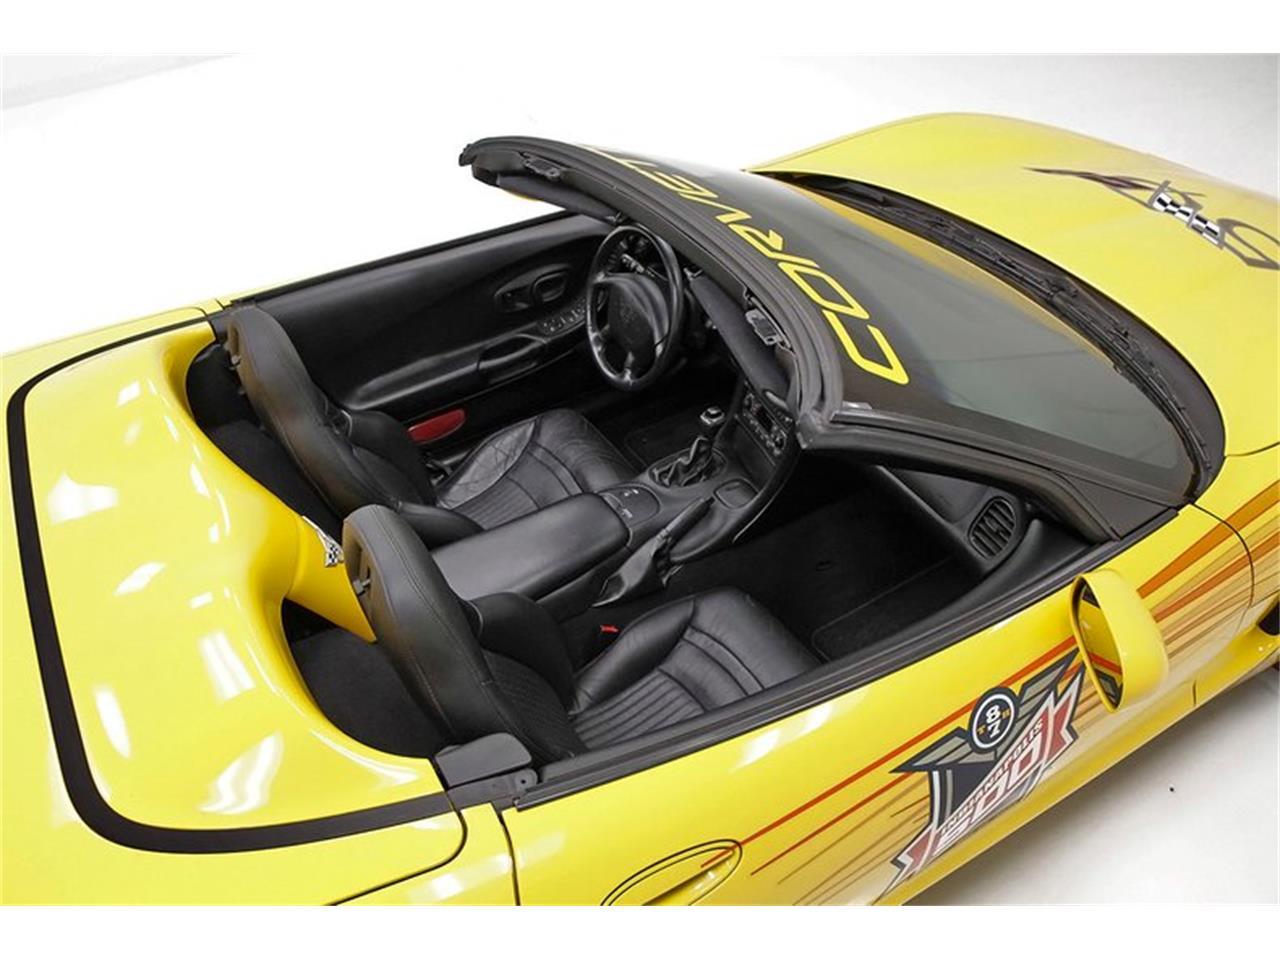 2003 Chevrolet Corvette (CC-1214126) for sale in Morgantown, Pennsylvania